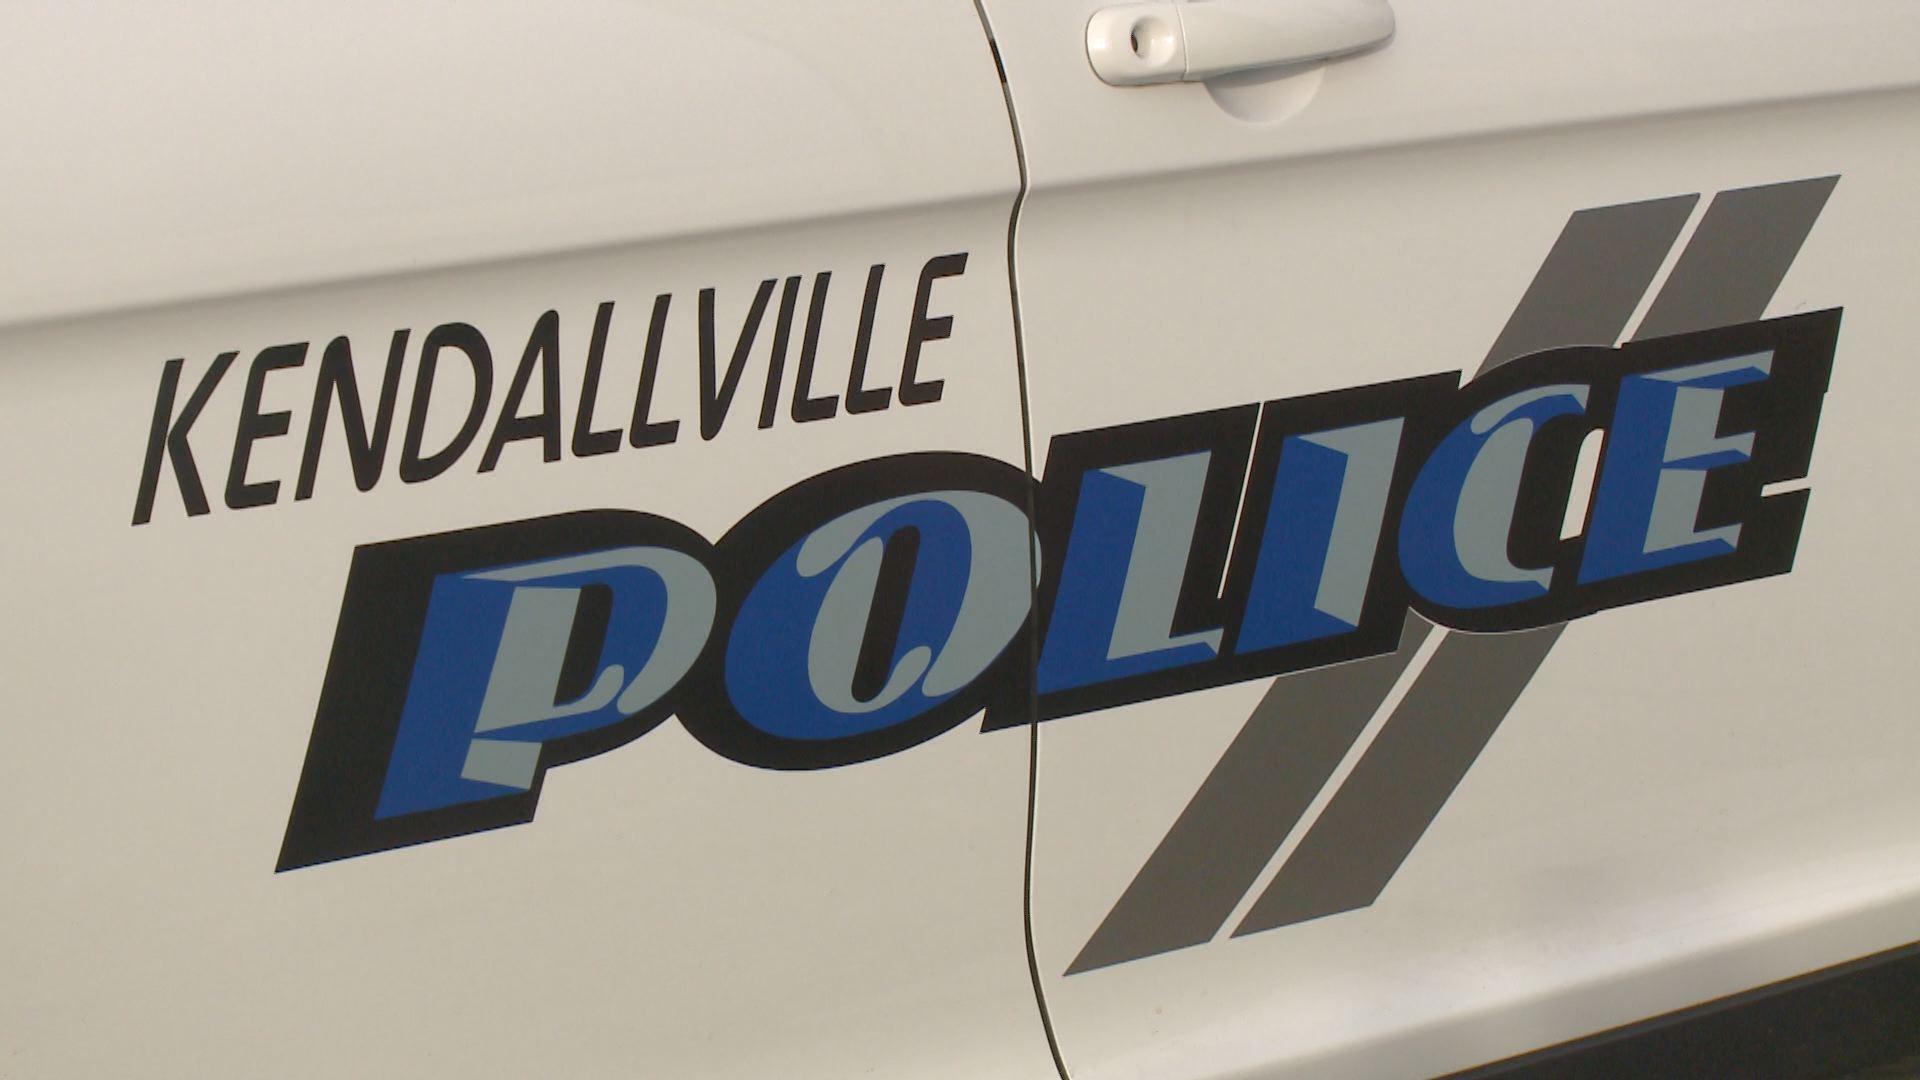 Kendallville Police_1542320032983.jpg.jpg